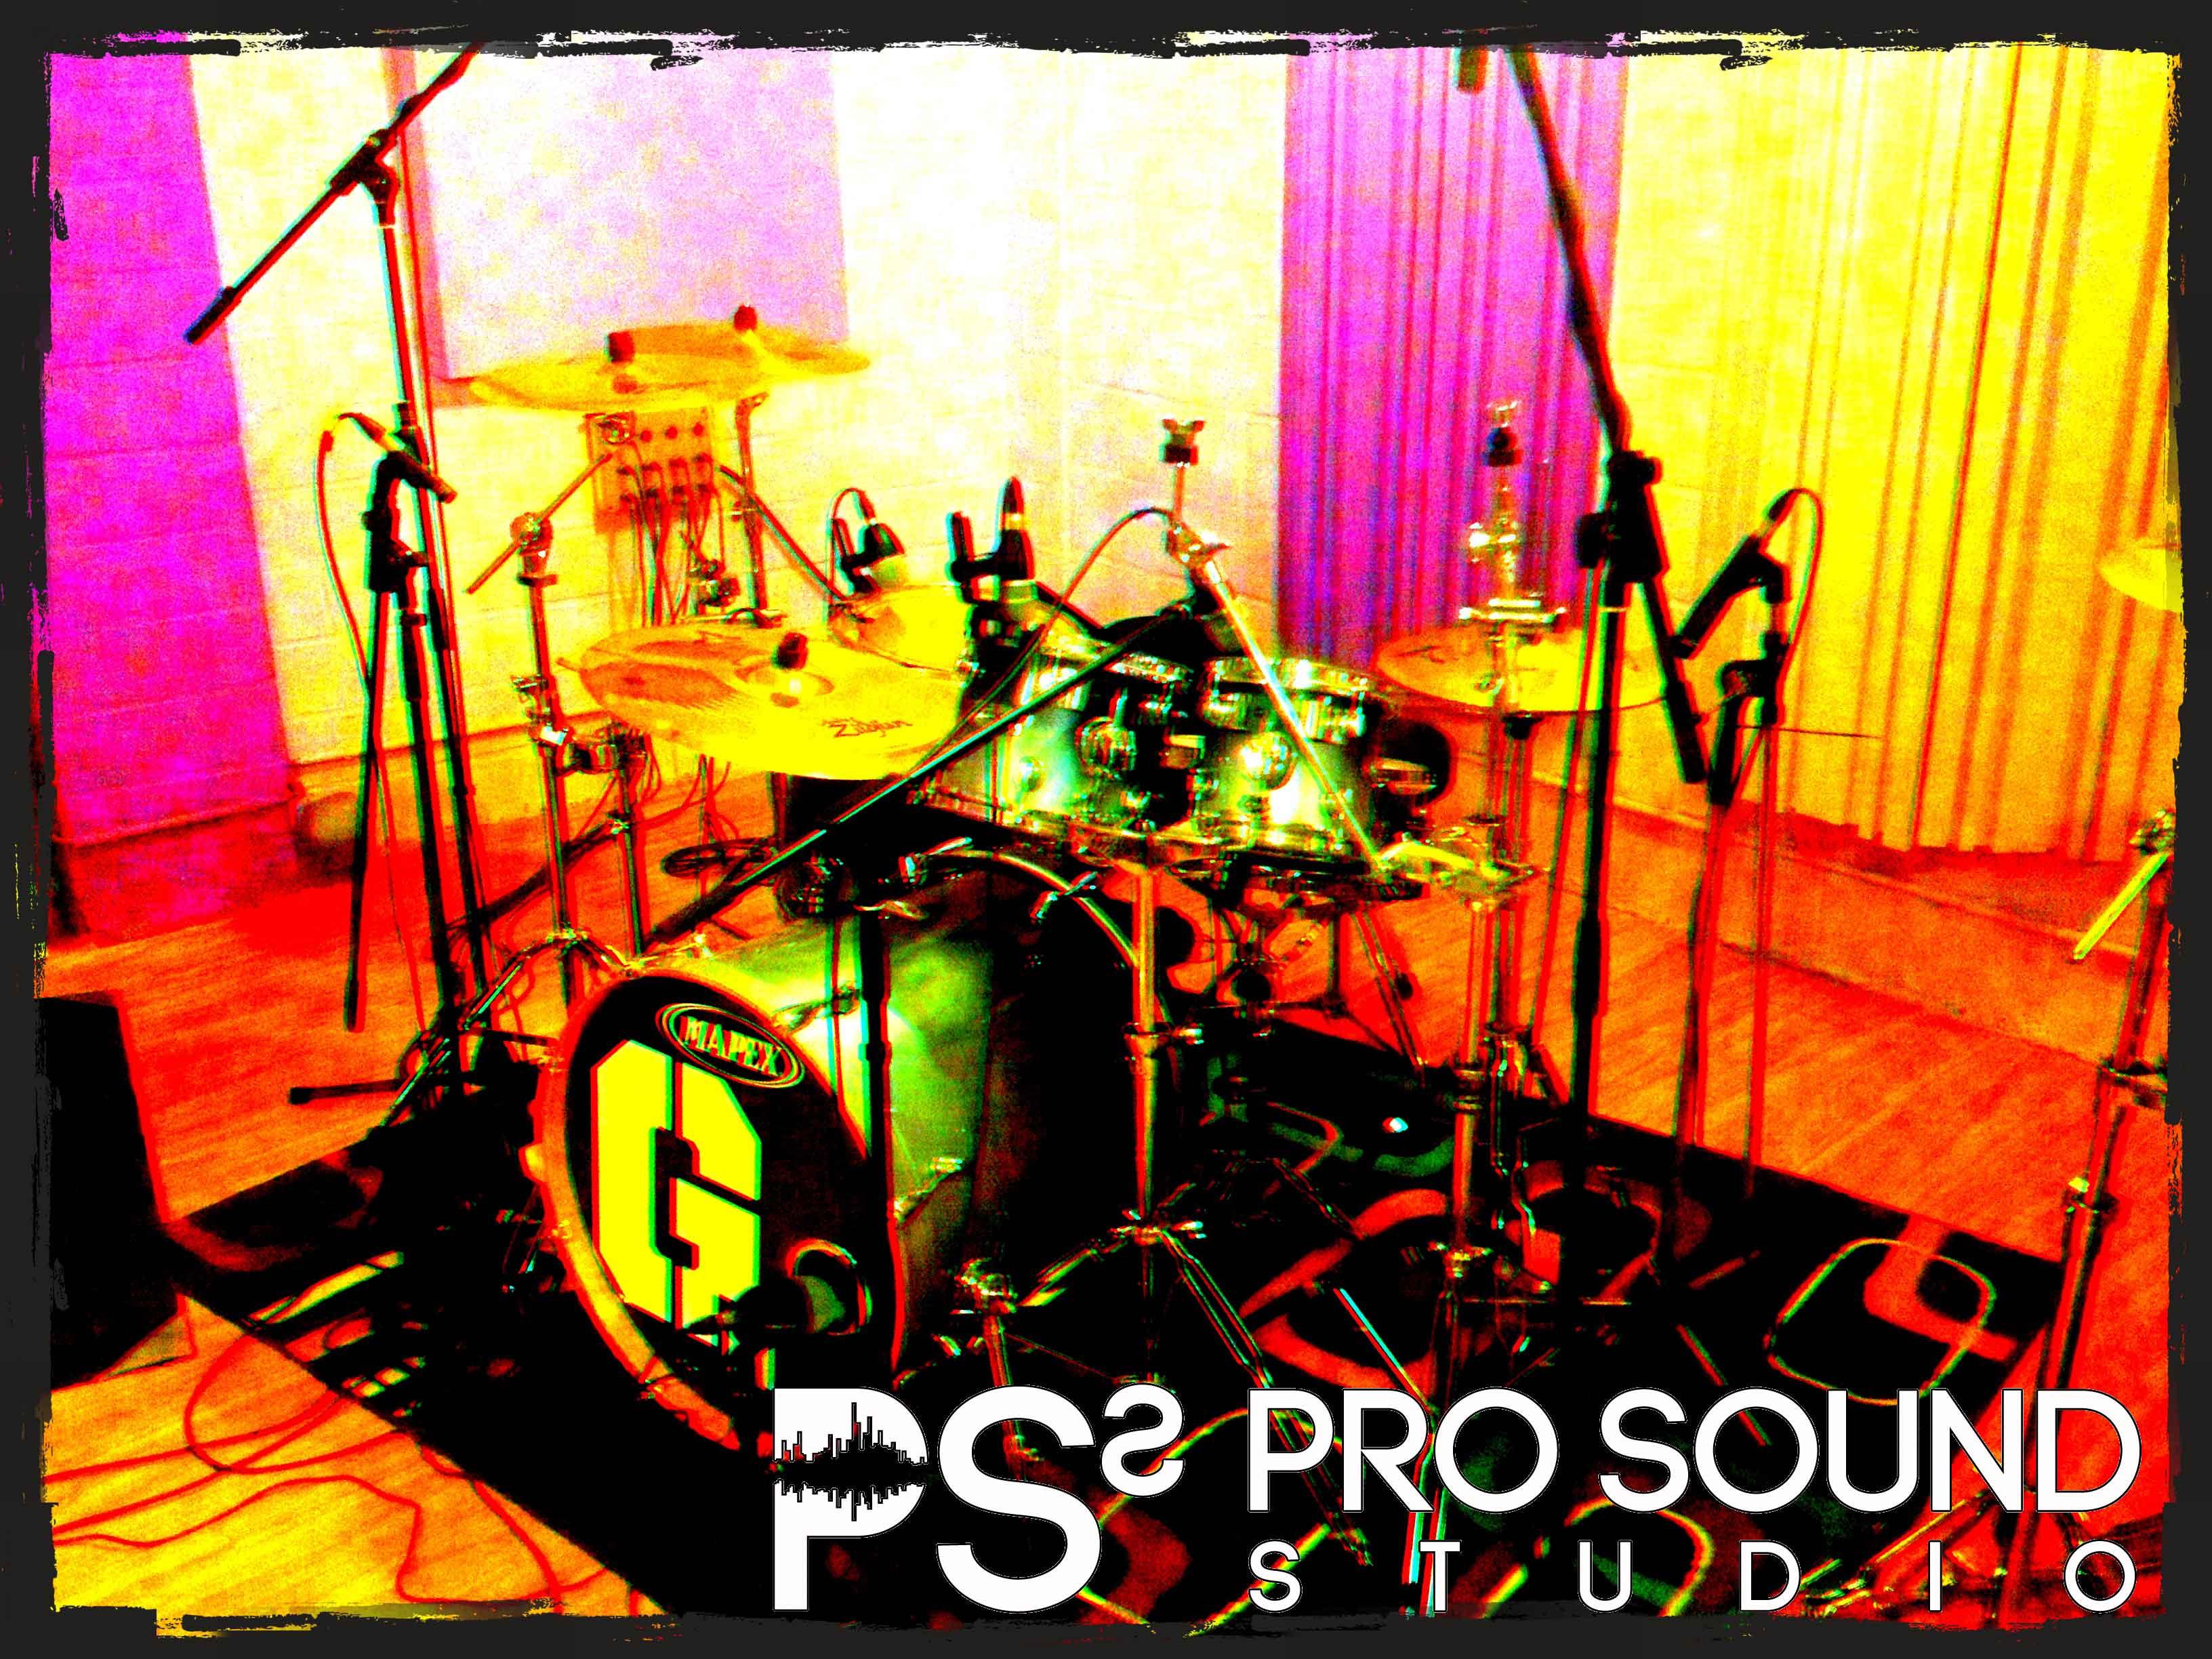 Drums-Sam Pro-Sound-Mons